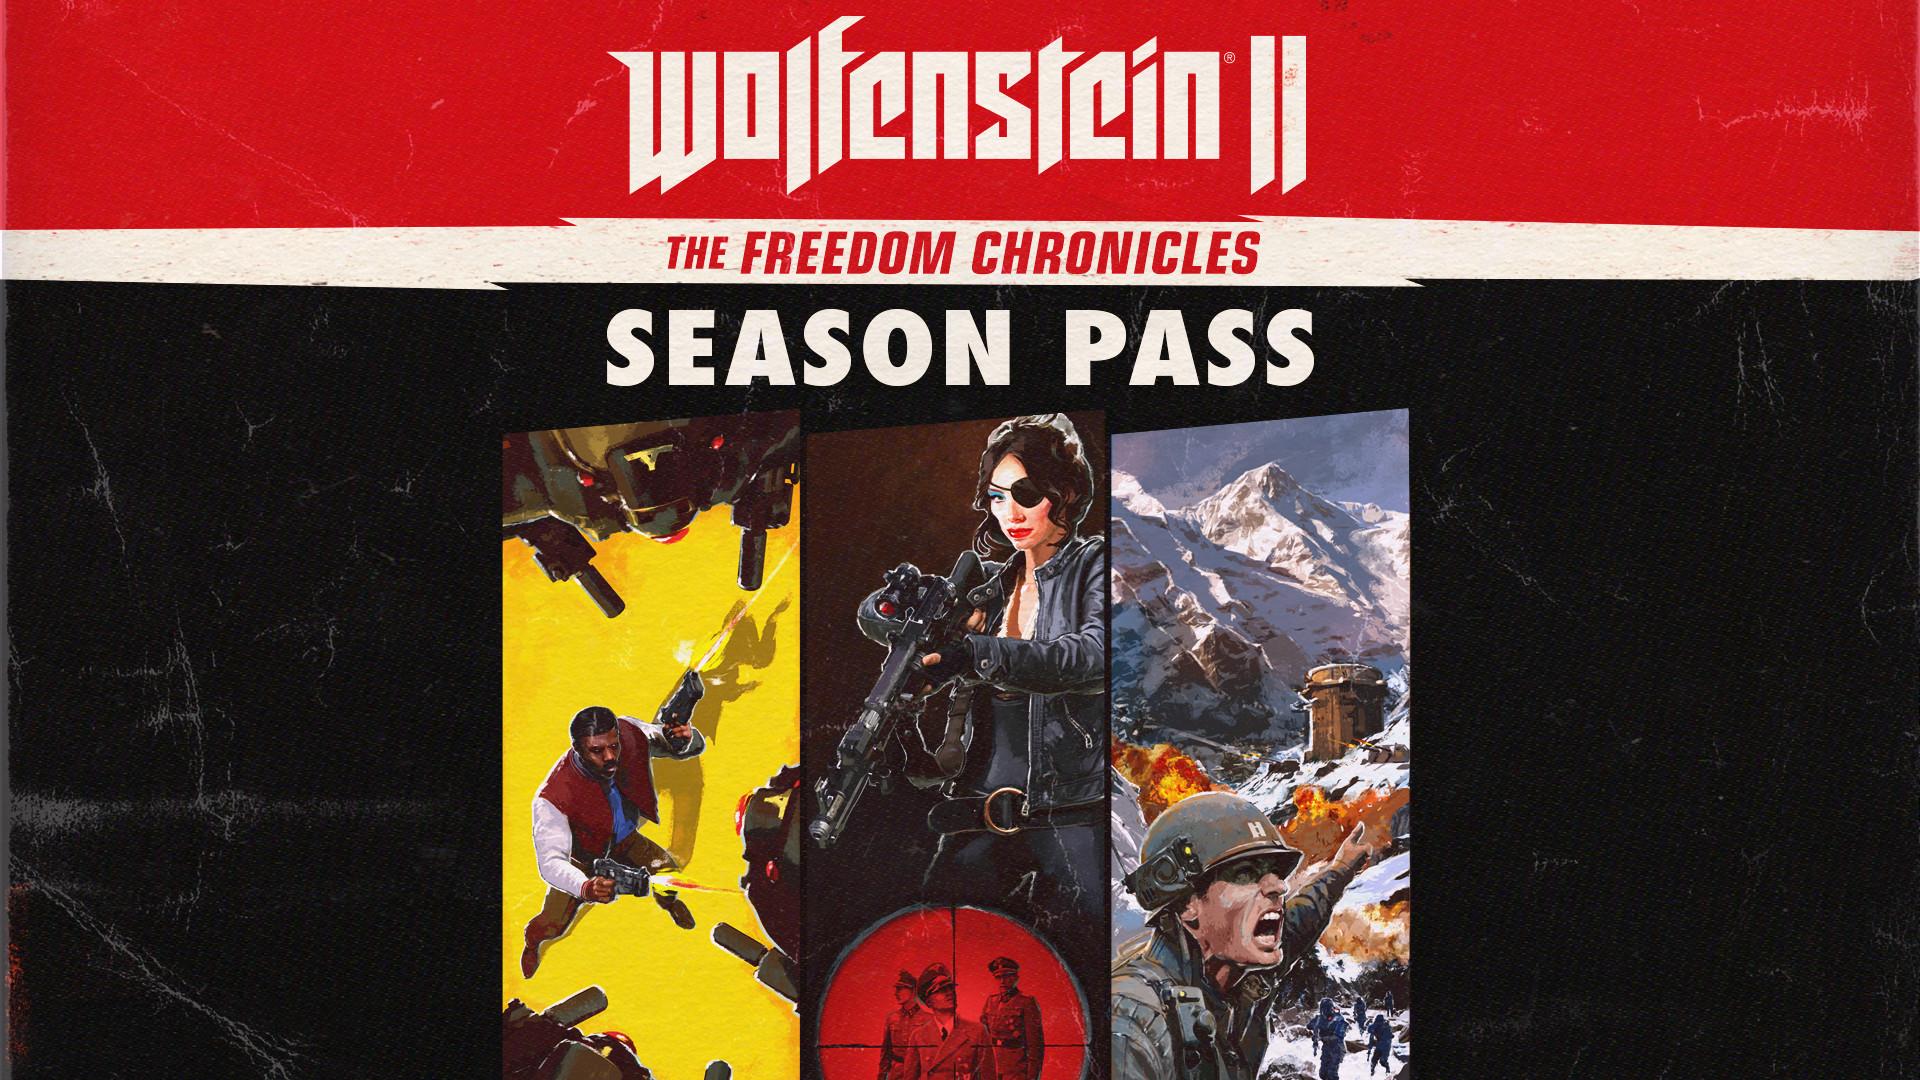 wolfenstein 2 game free download full version for pc